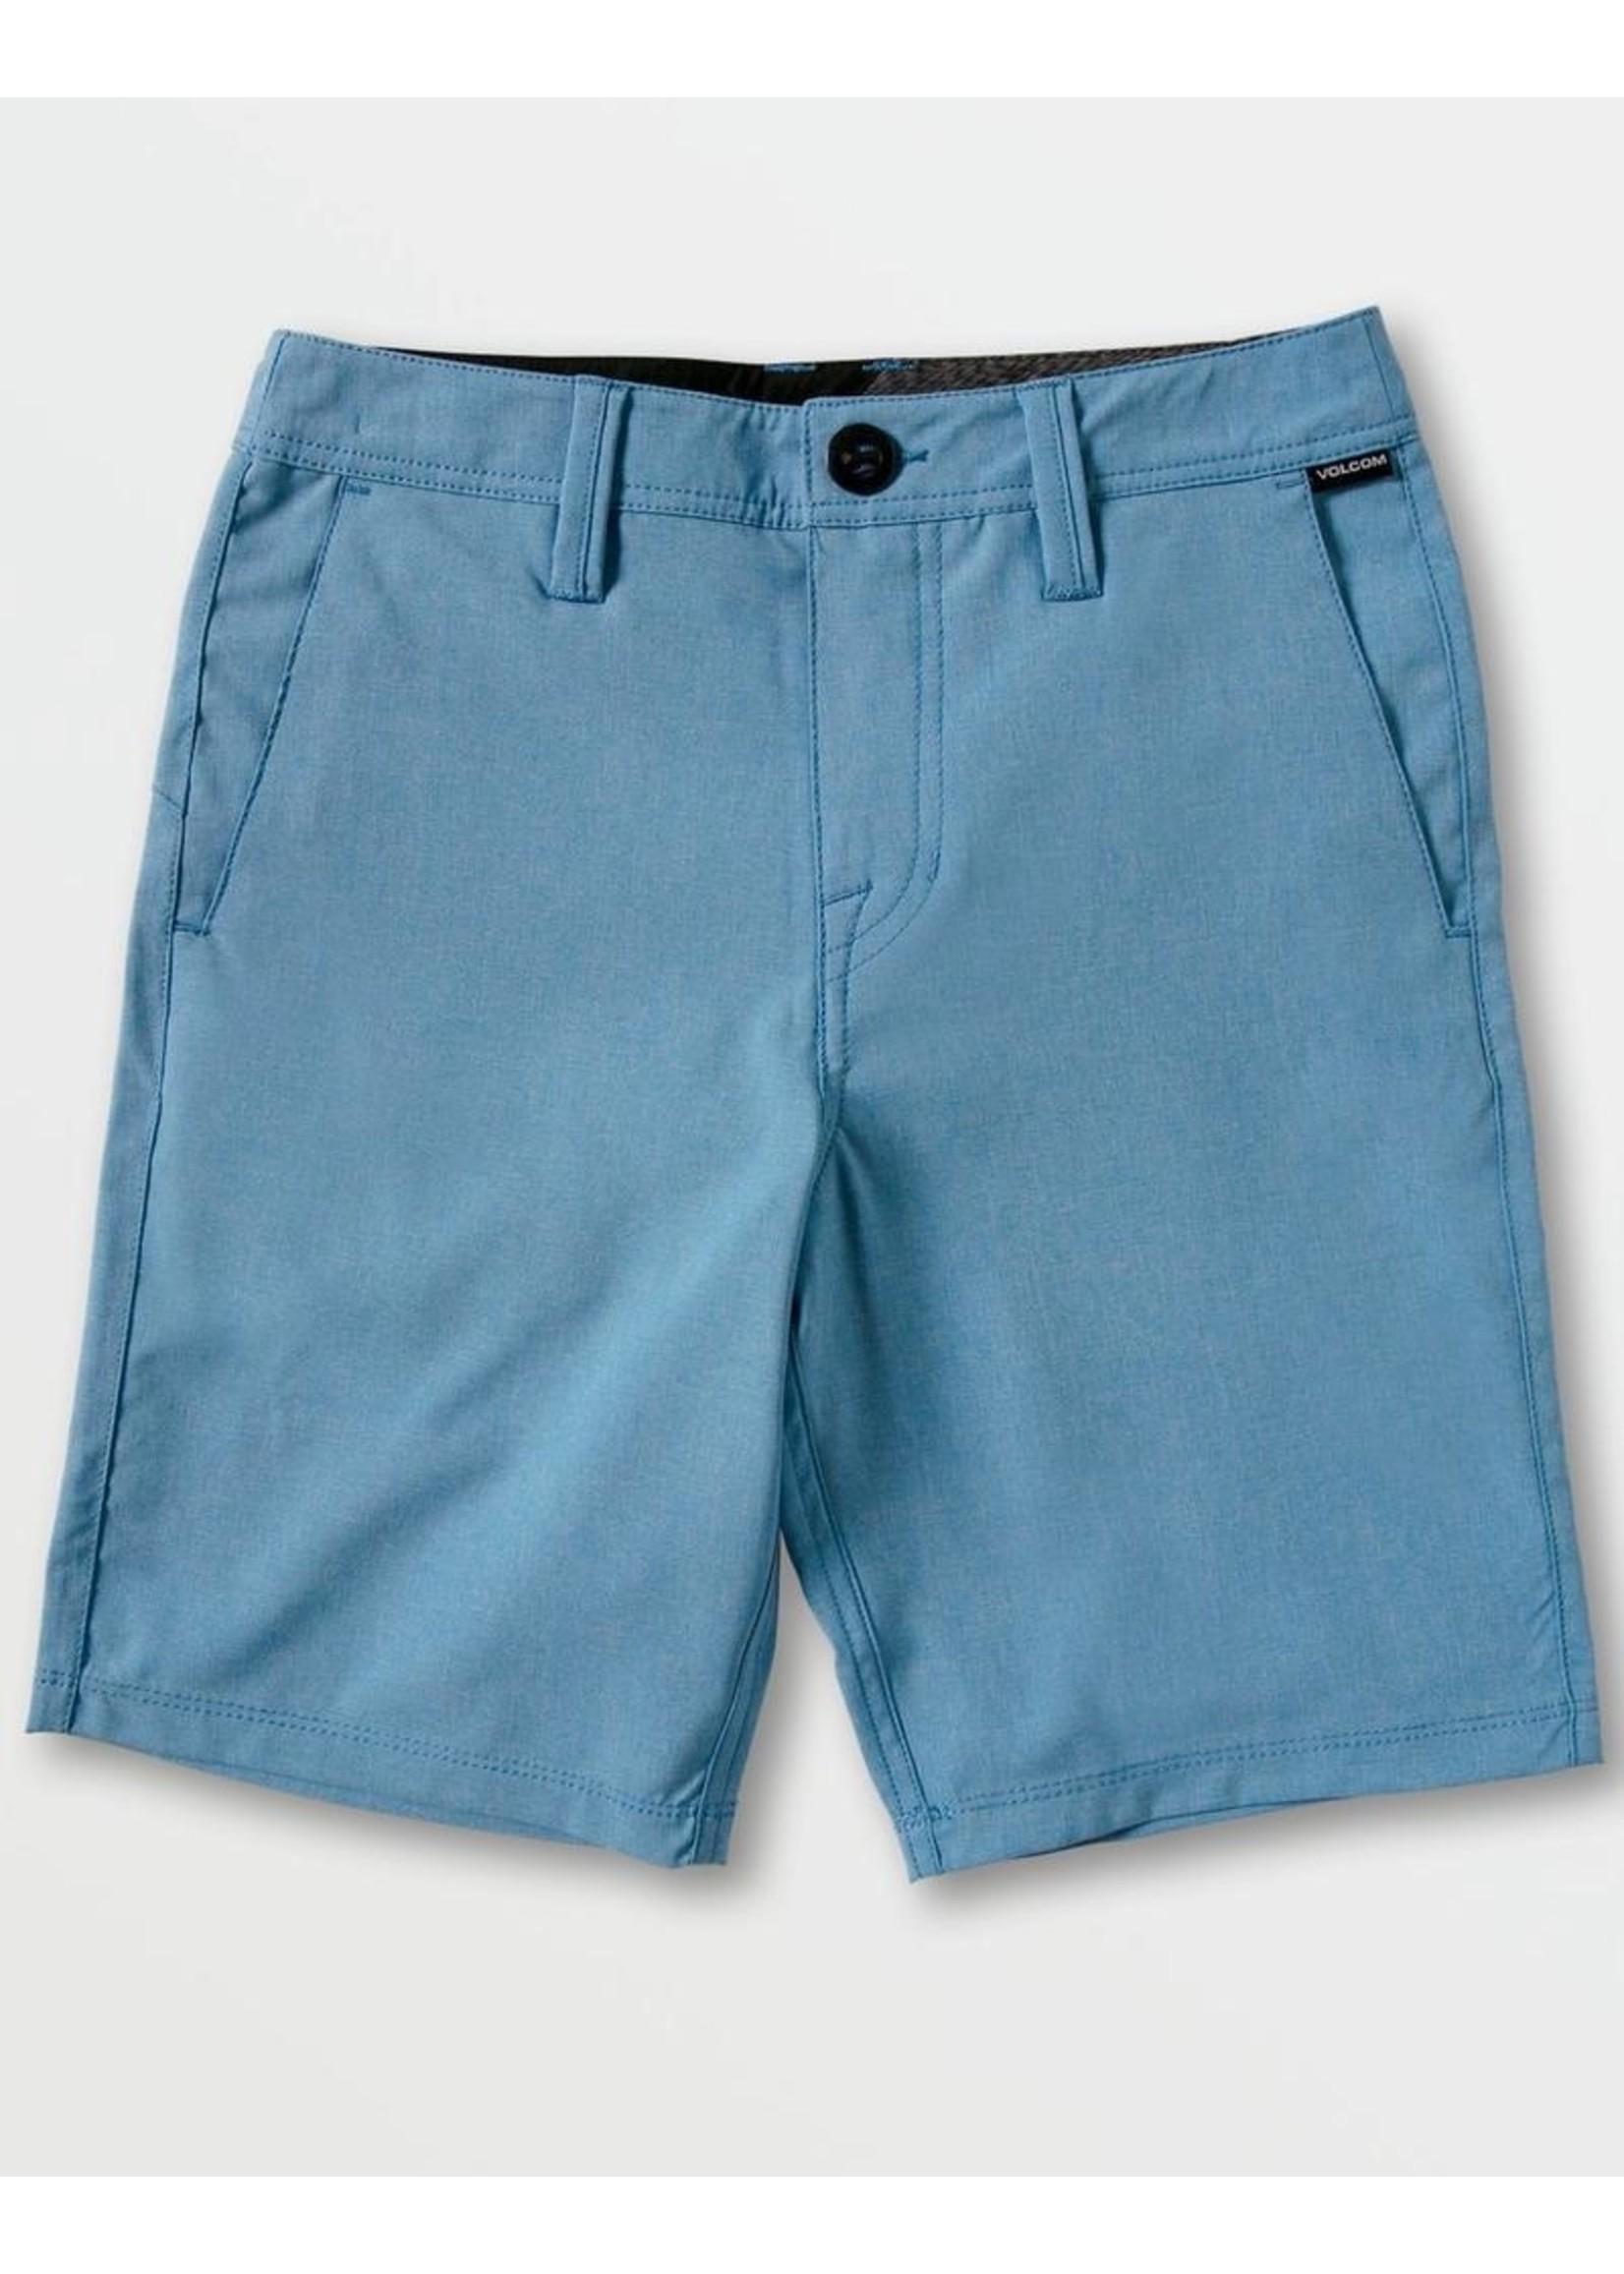 Volcom Volcom Kids, Big Boys Ballpoint BLue Fricken Surf N' Turf Static Shorts